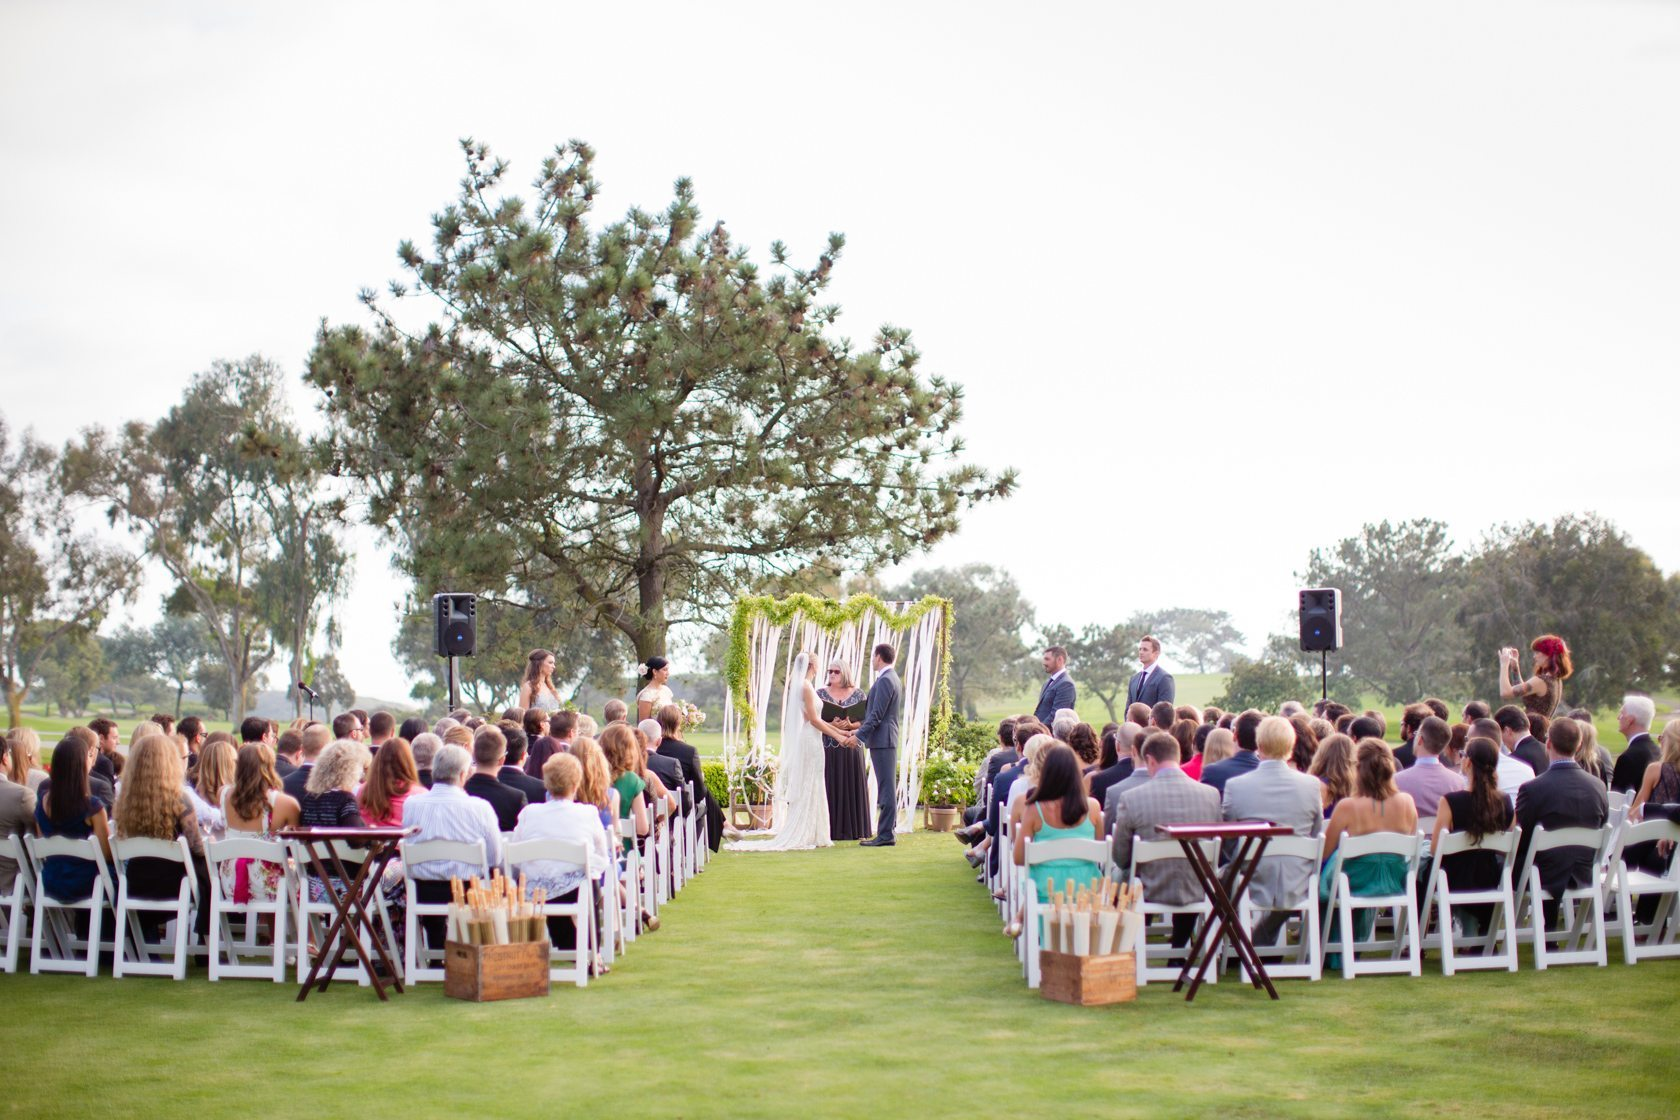 The_Lodge_at_Torrey_Pines_Wedding_057.jpg